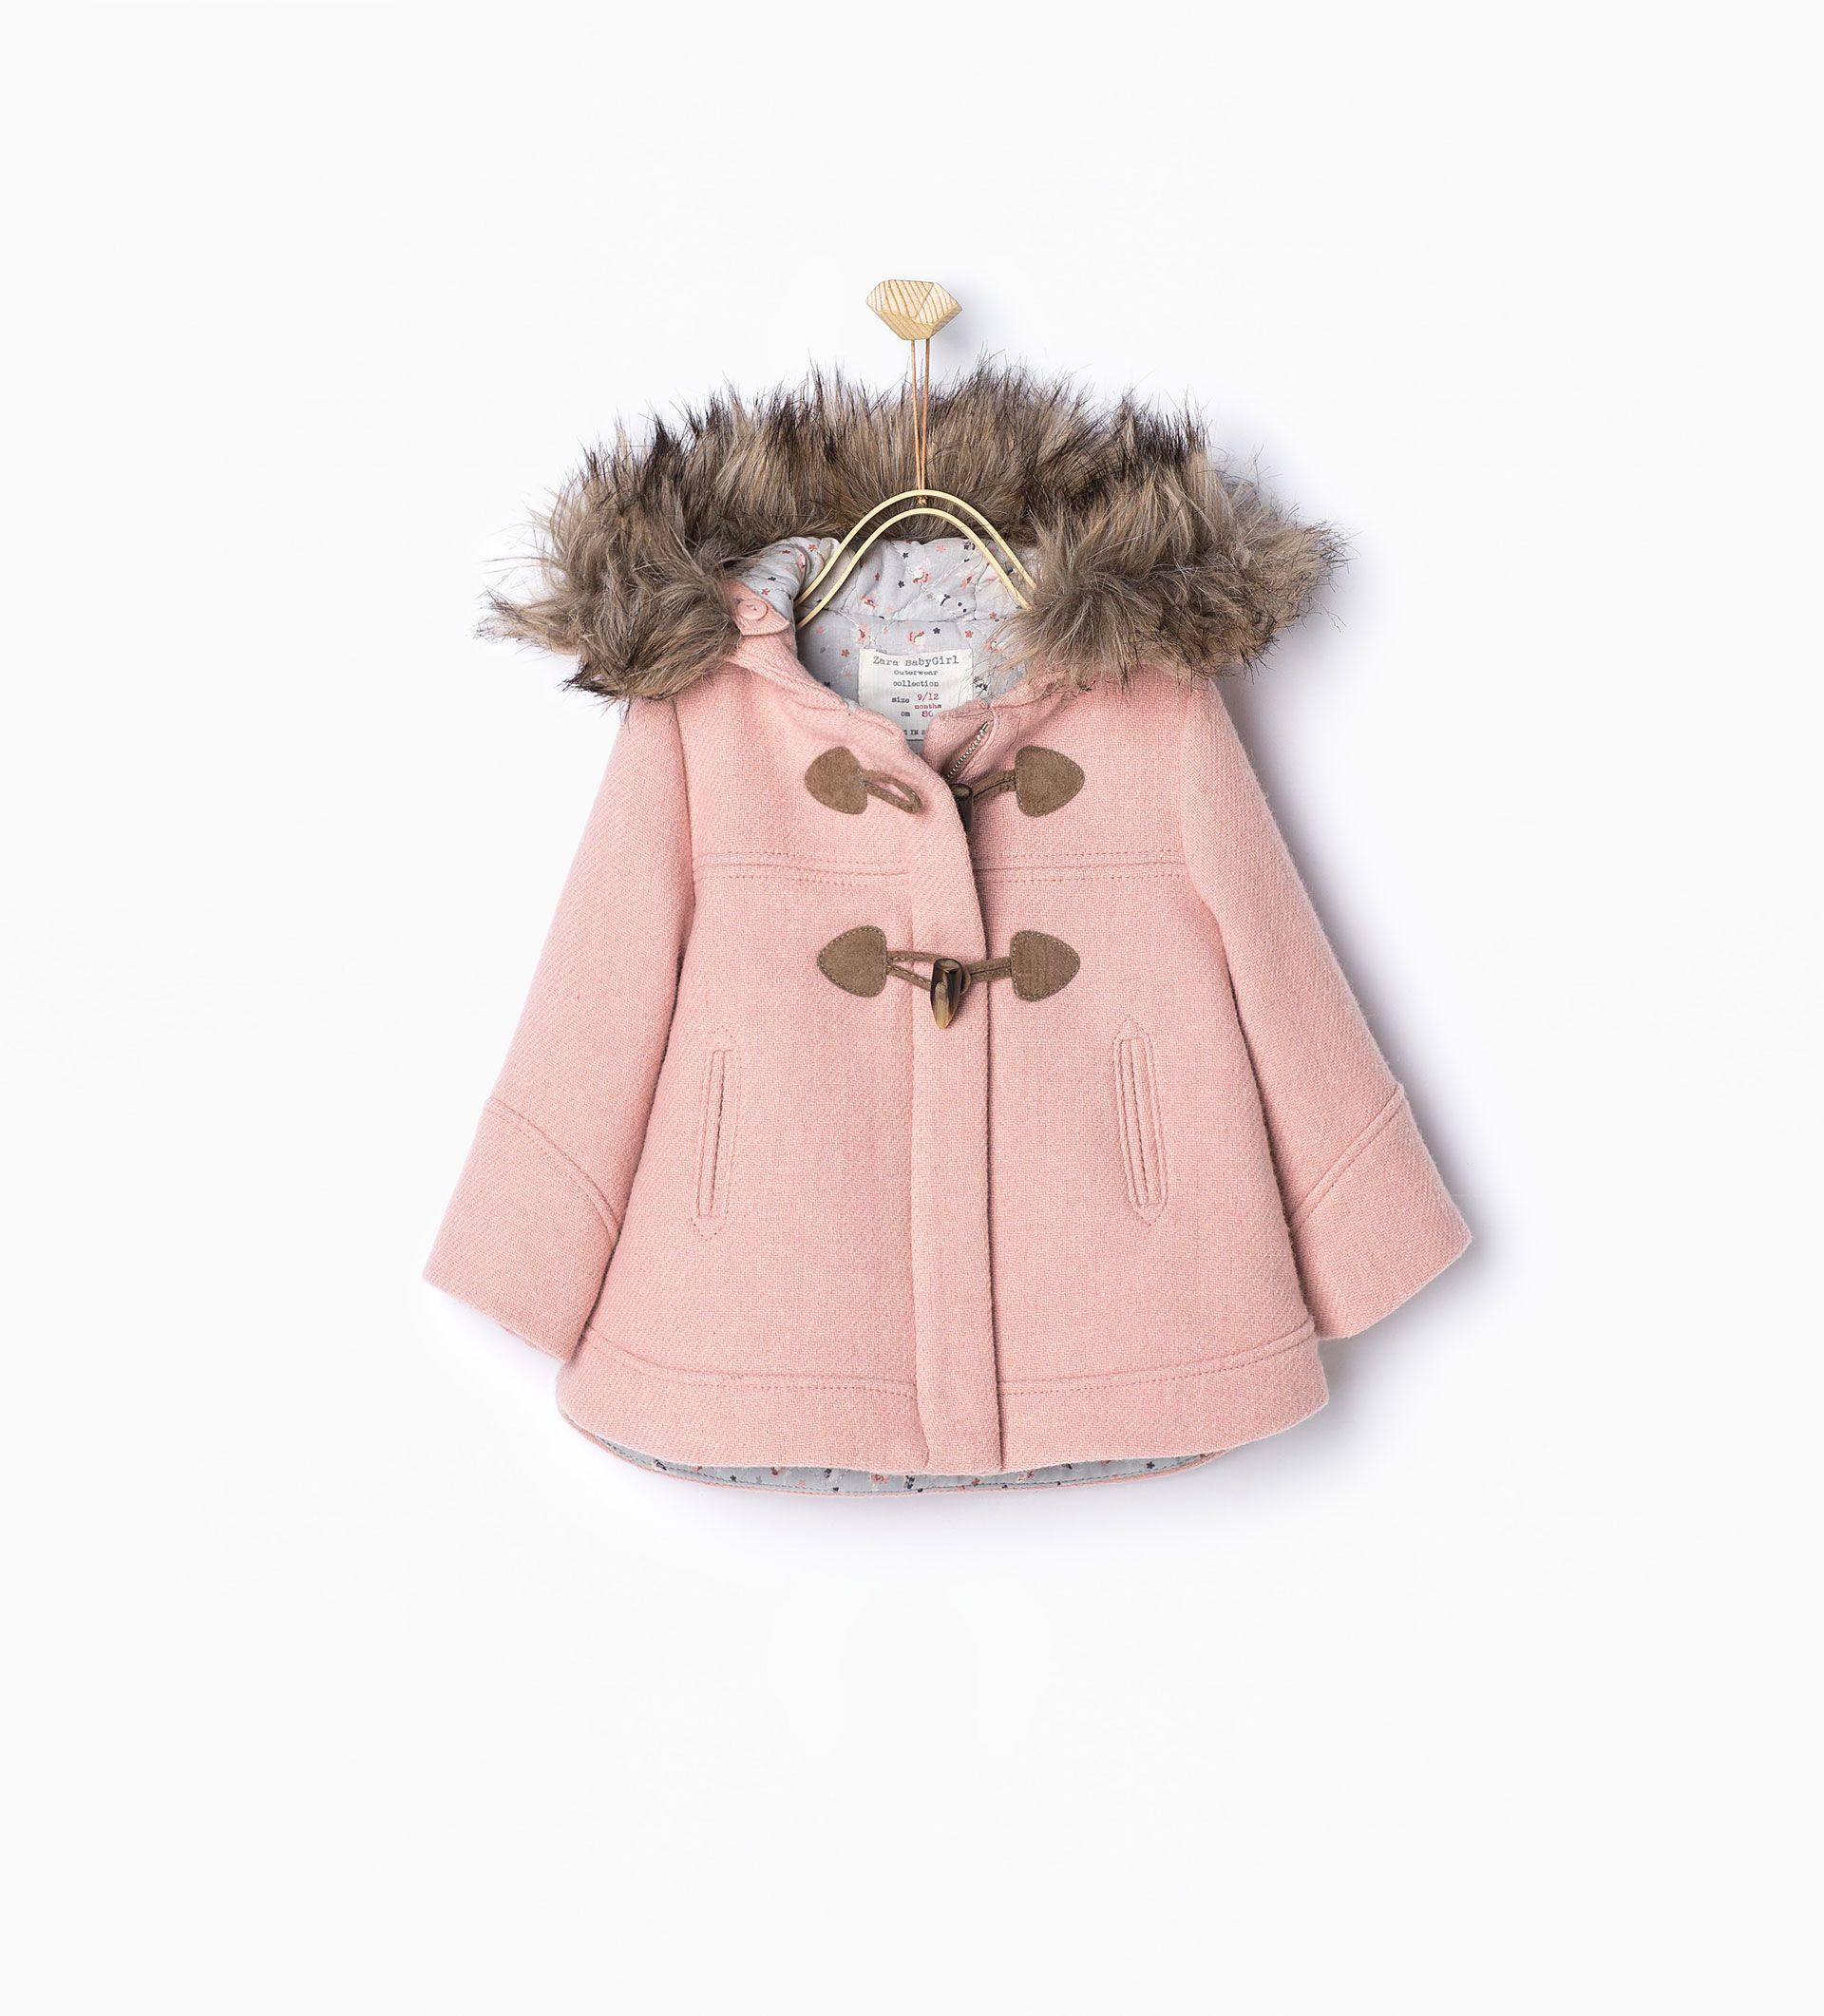 Duffle Coat With Fur Hood Coats Baby Girl 3 Months 4 Years Kids Zara Turkey Babykleidung Madchen Kinderkleidung Madchen Klamotten